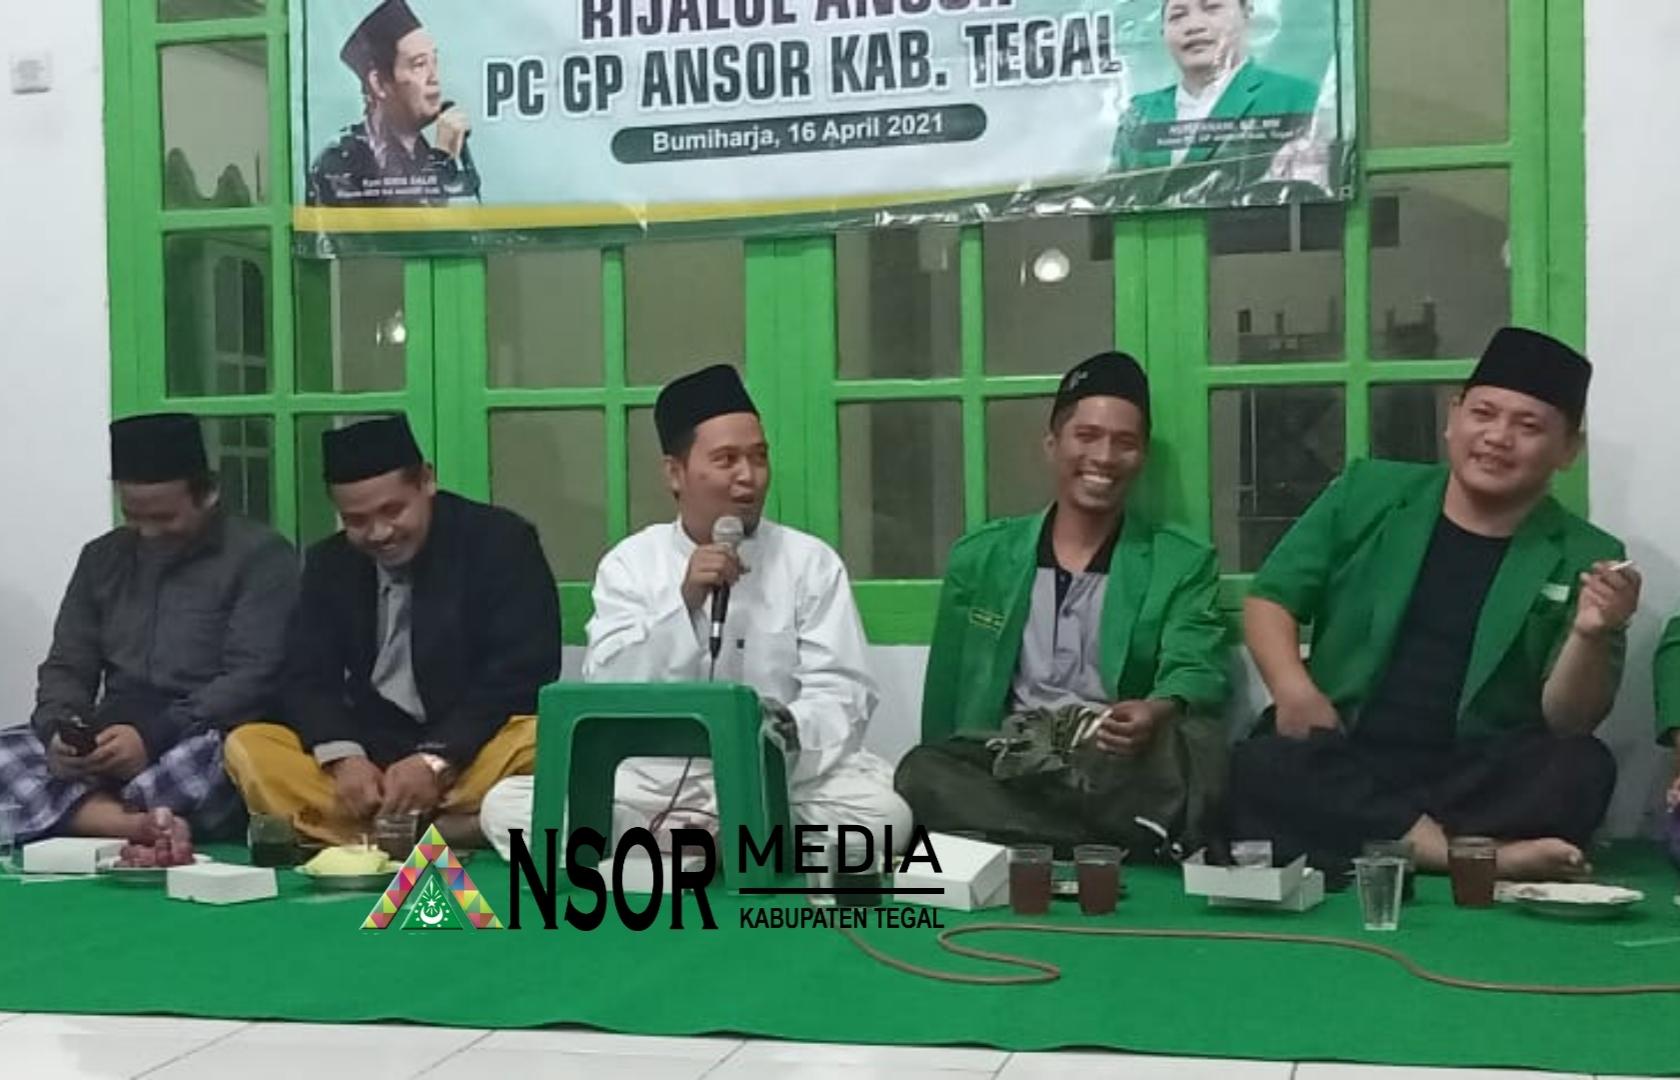 Syiar Ramadhan, PC Ansor Tegal Gelar Tarhim di 6 Zona, GP Ansor